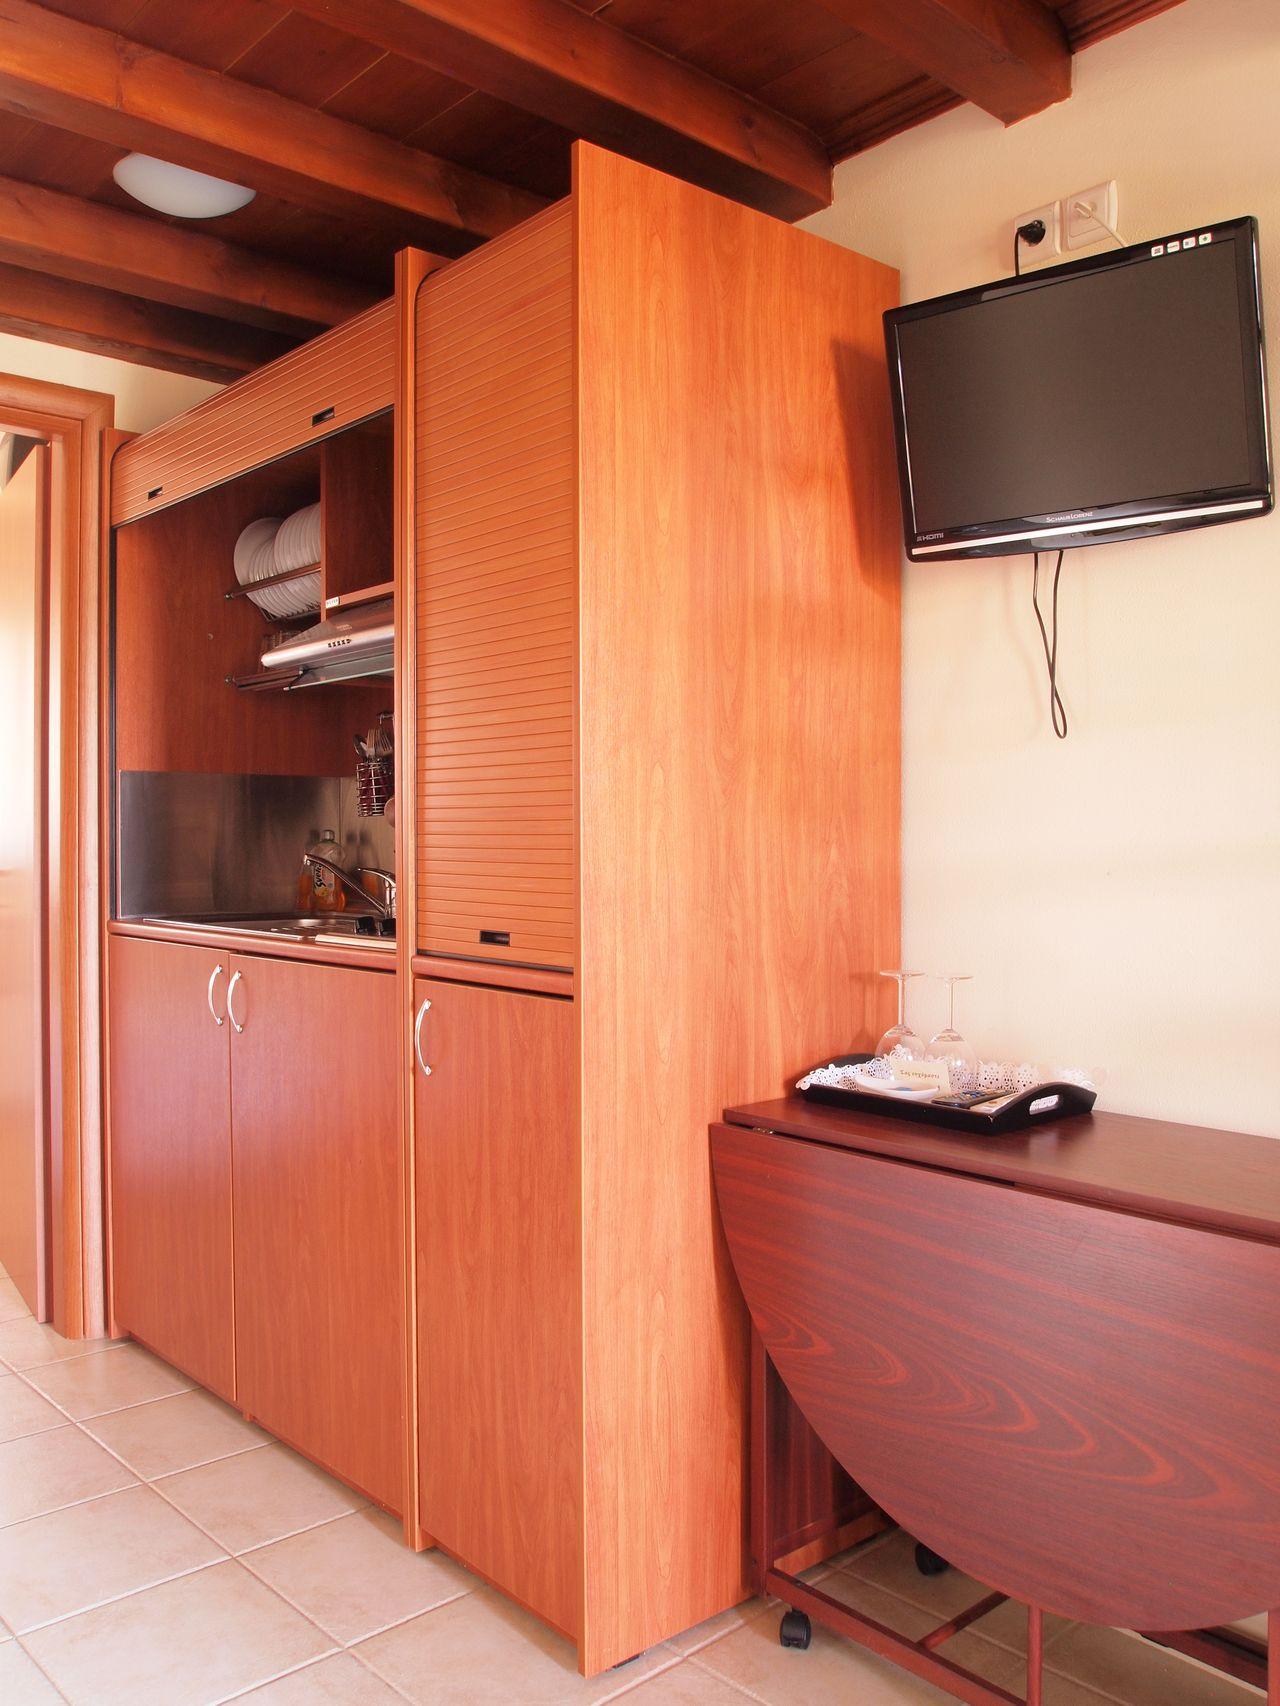 Agkira Apartment